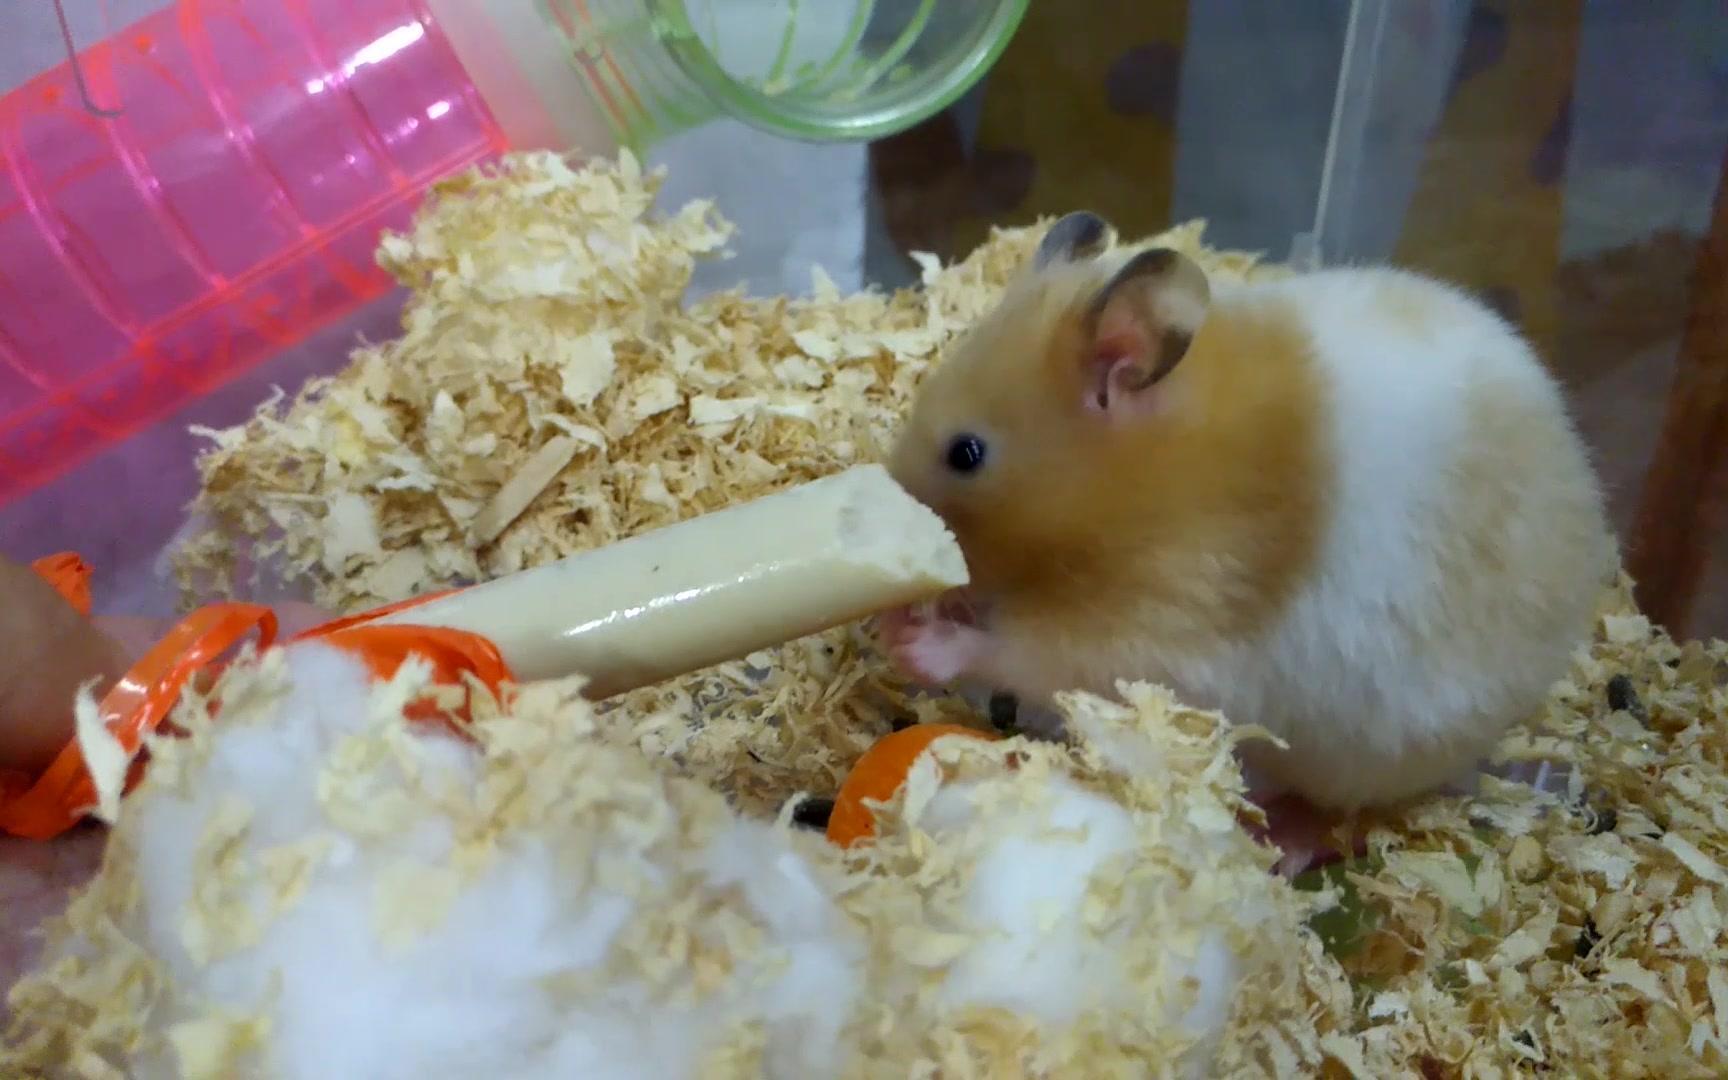 火腿好美味~第一次吃火腿的小激動_嗶哩嗶哩 (゜-゜)つロ 干杯~-bilibili